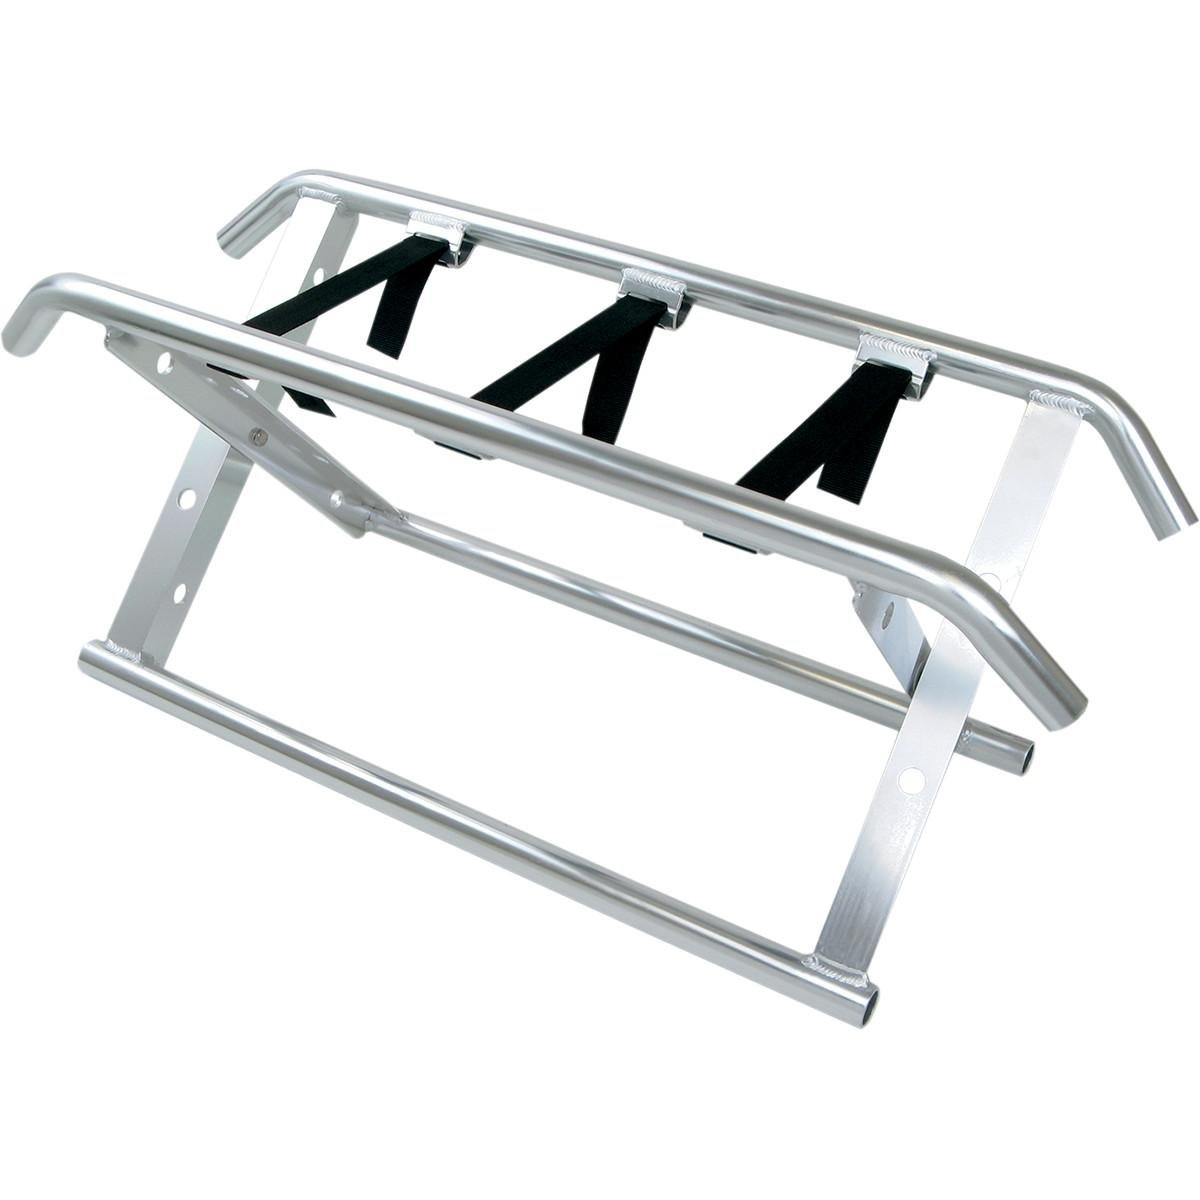 Motorsport Products PWC Shoreline Scissor Stand/Stand Up 79-1001 by Motorsport Products